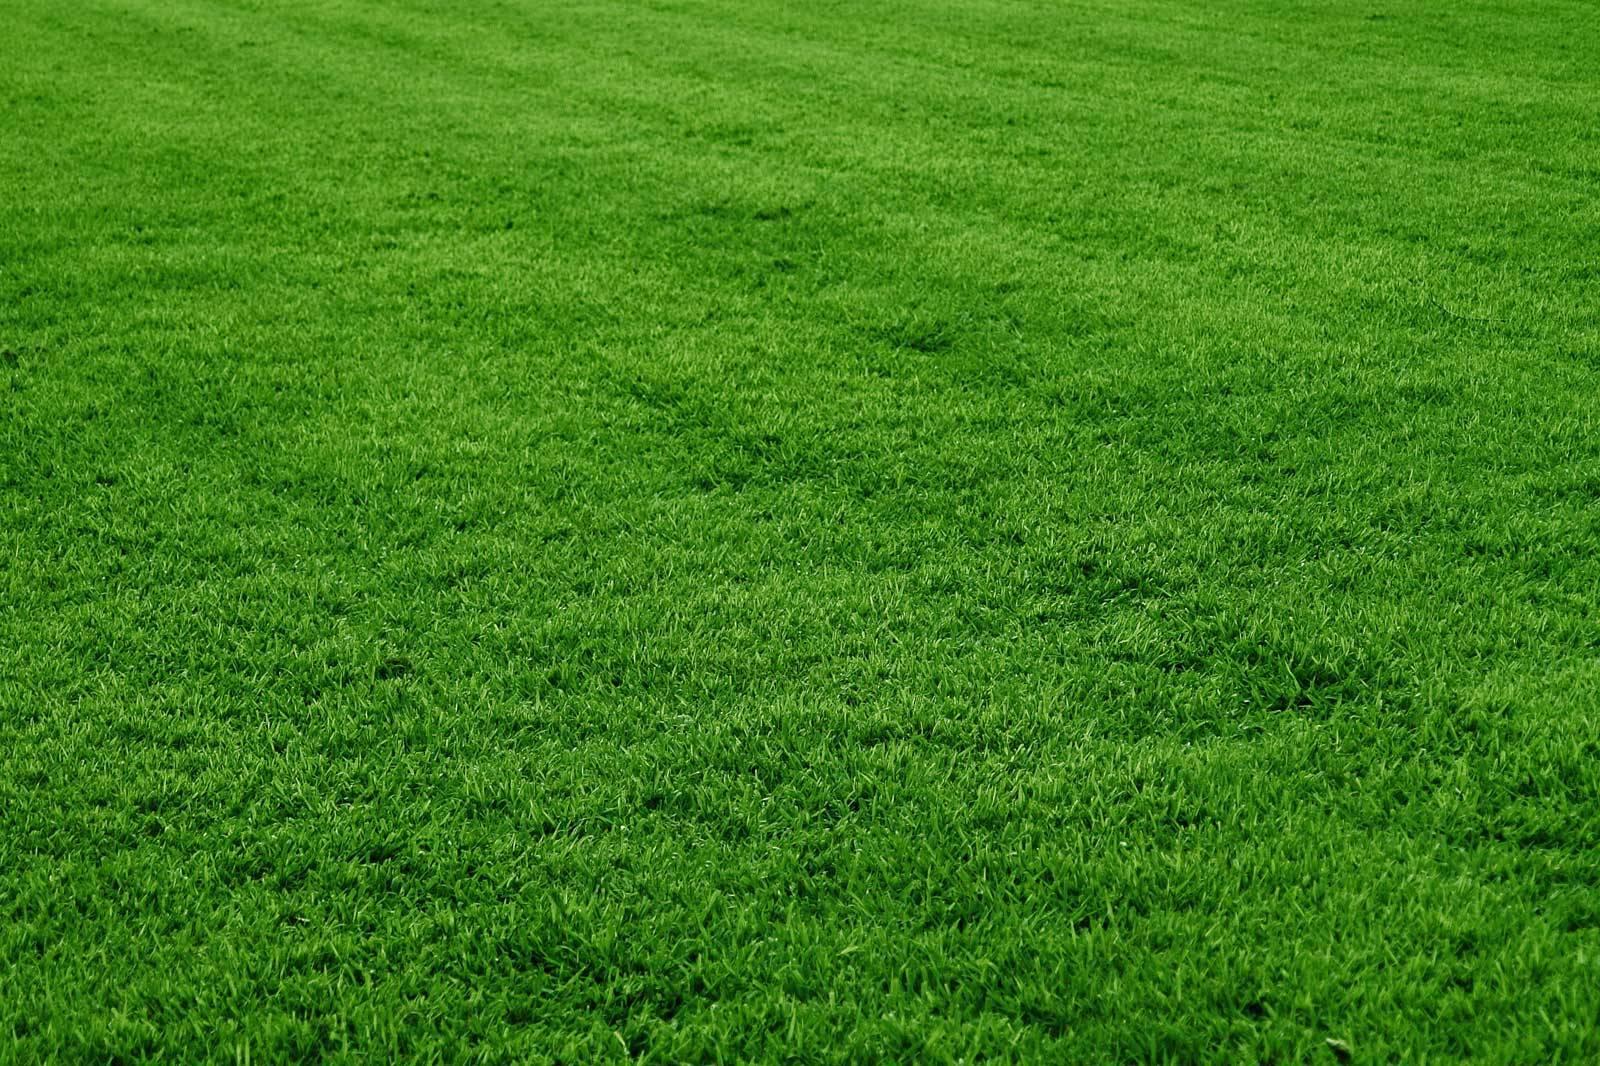 14178d2c601f0cd6e50c_grass.jpg